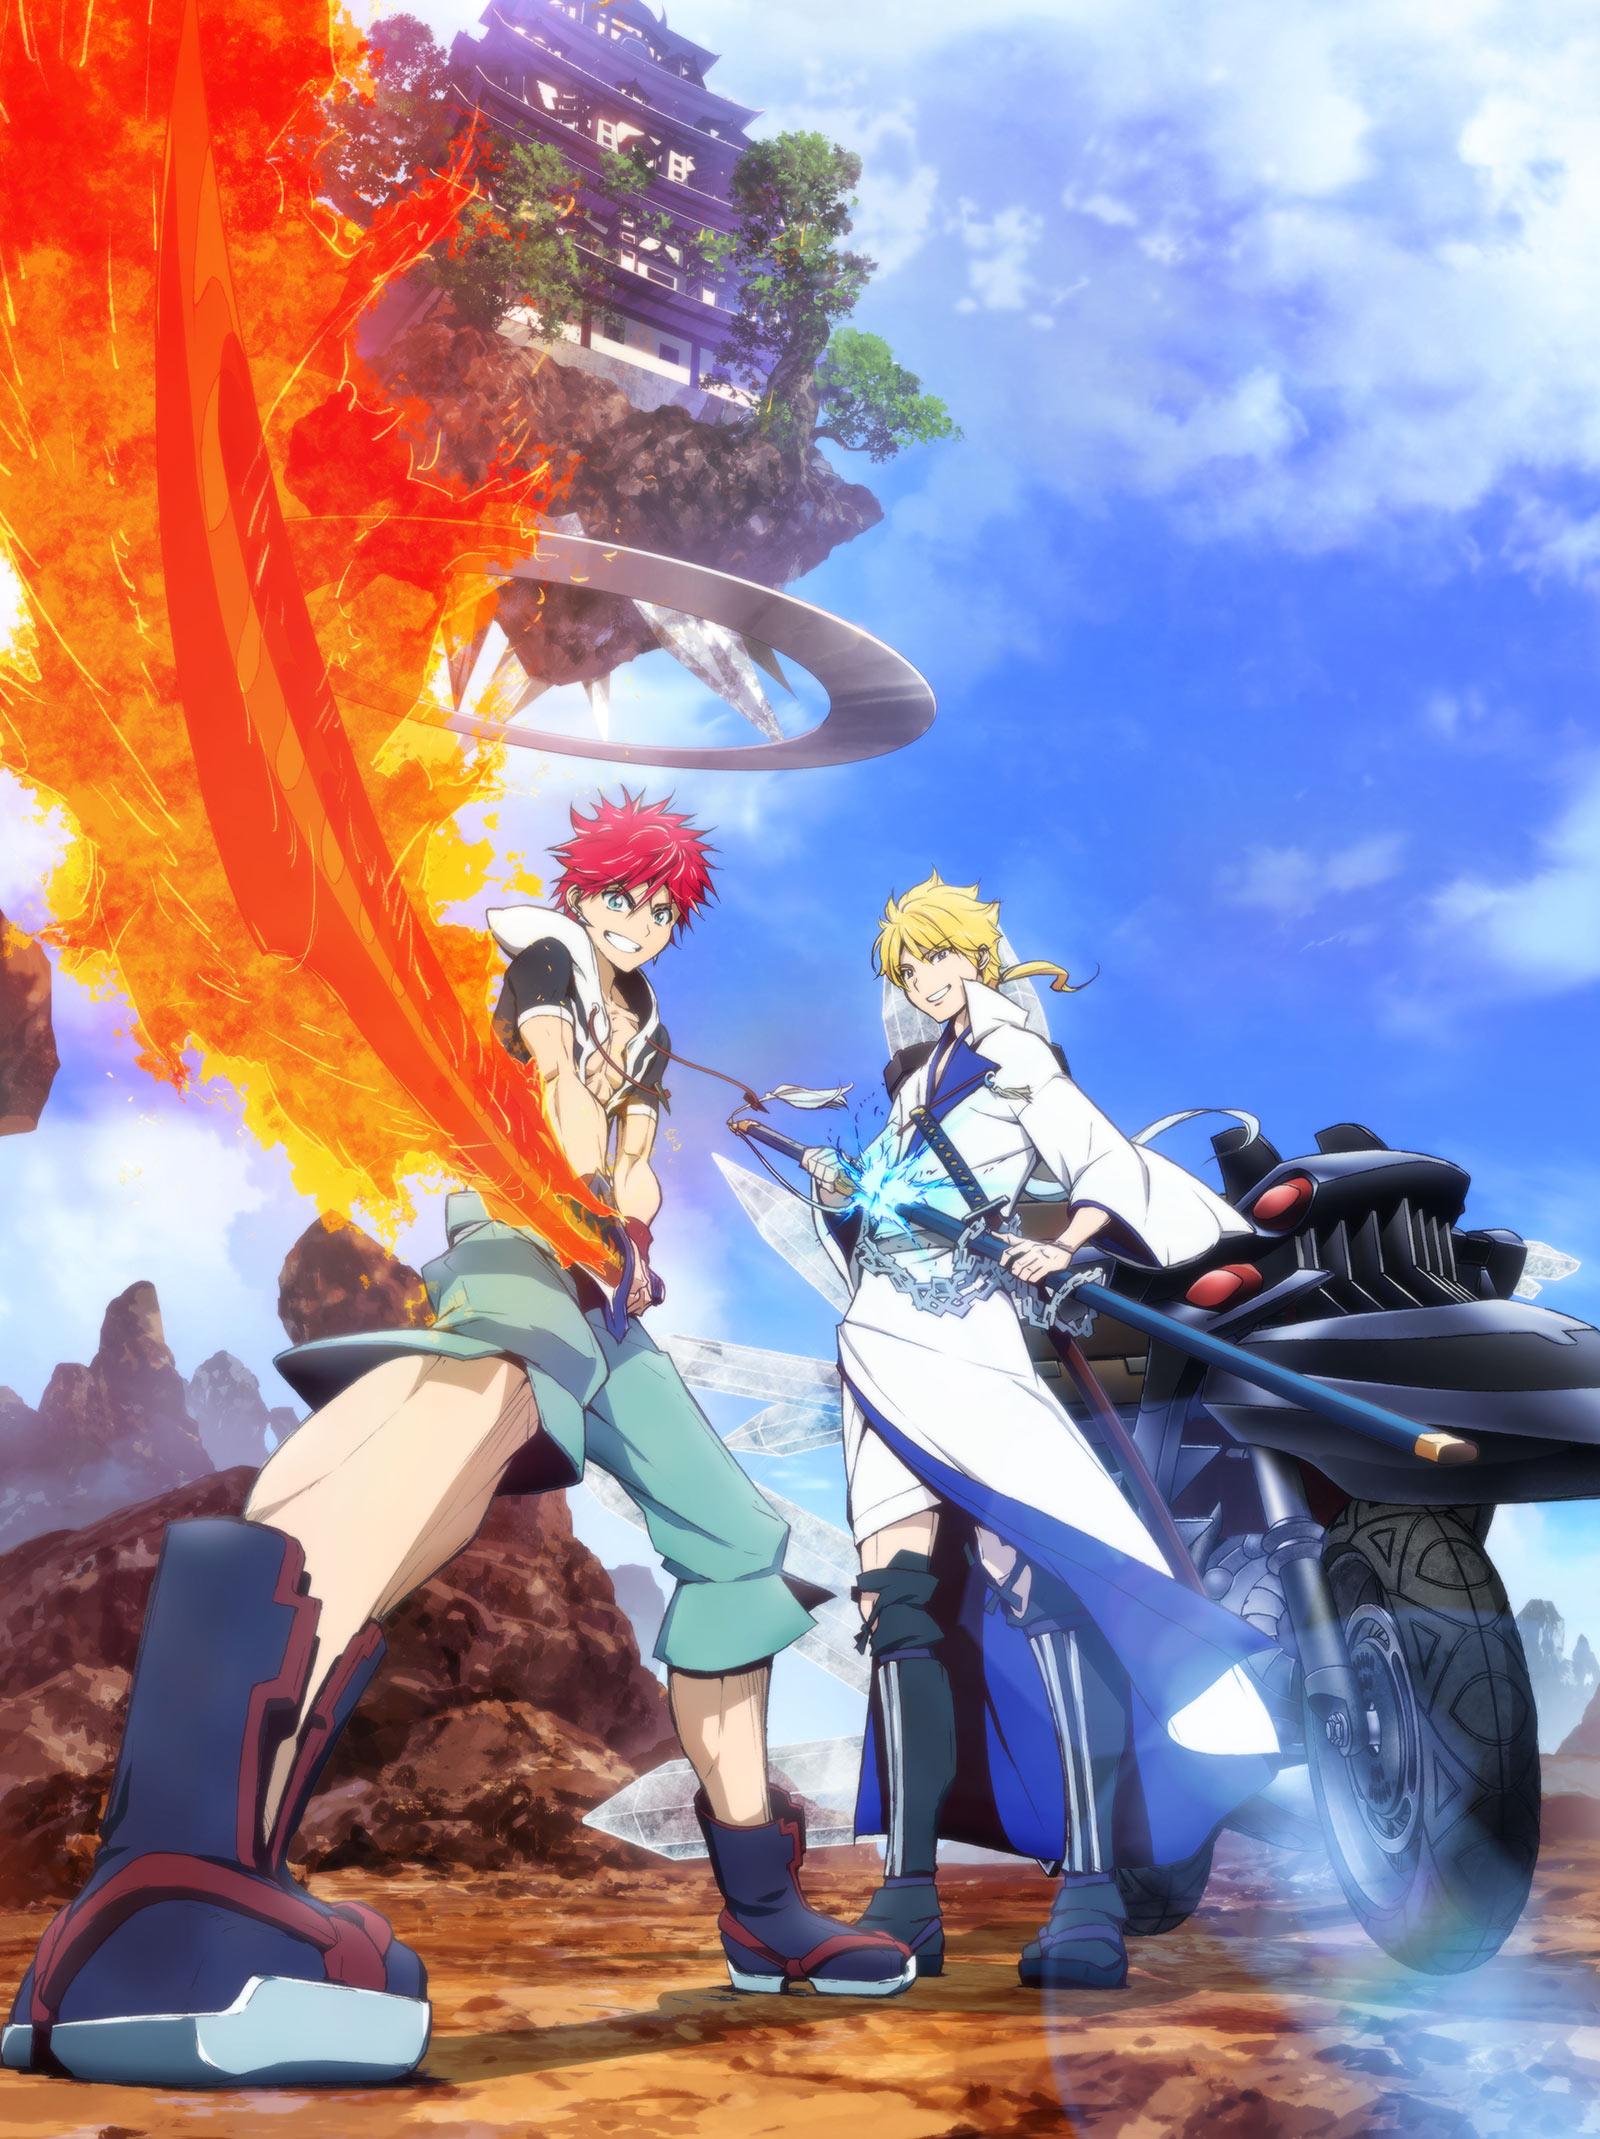 Orient Samurai Quest Teaser Shinobu Ohtaka Anime annonce Magi Studio ATCG Date de sortie 2022 Visuel